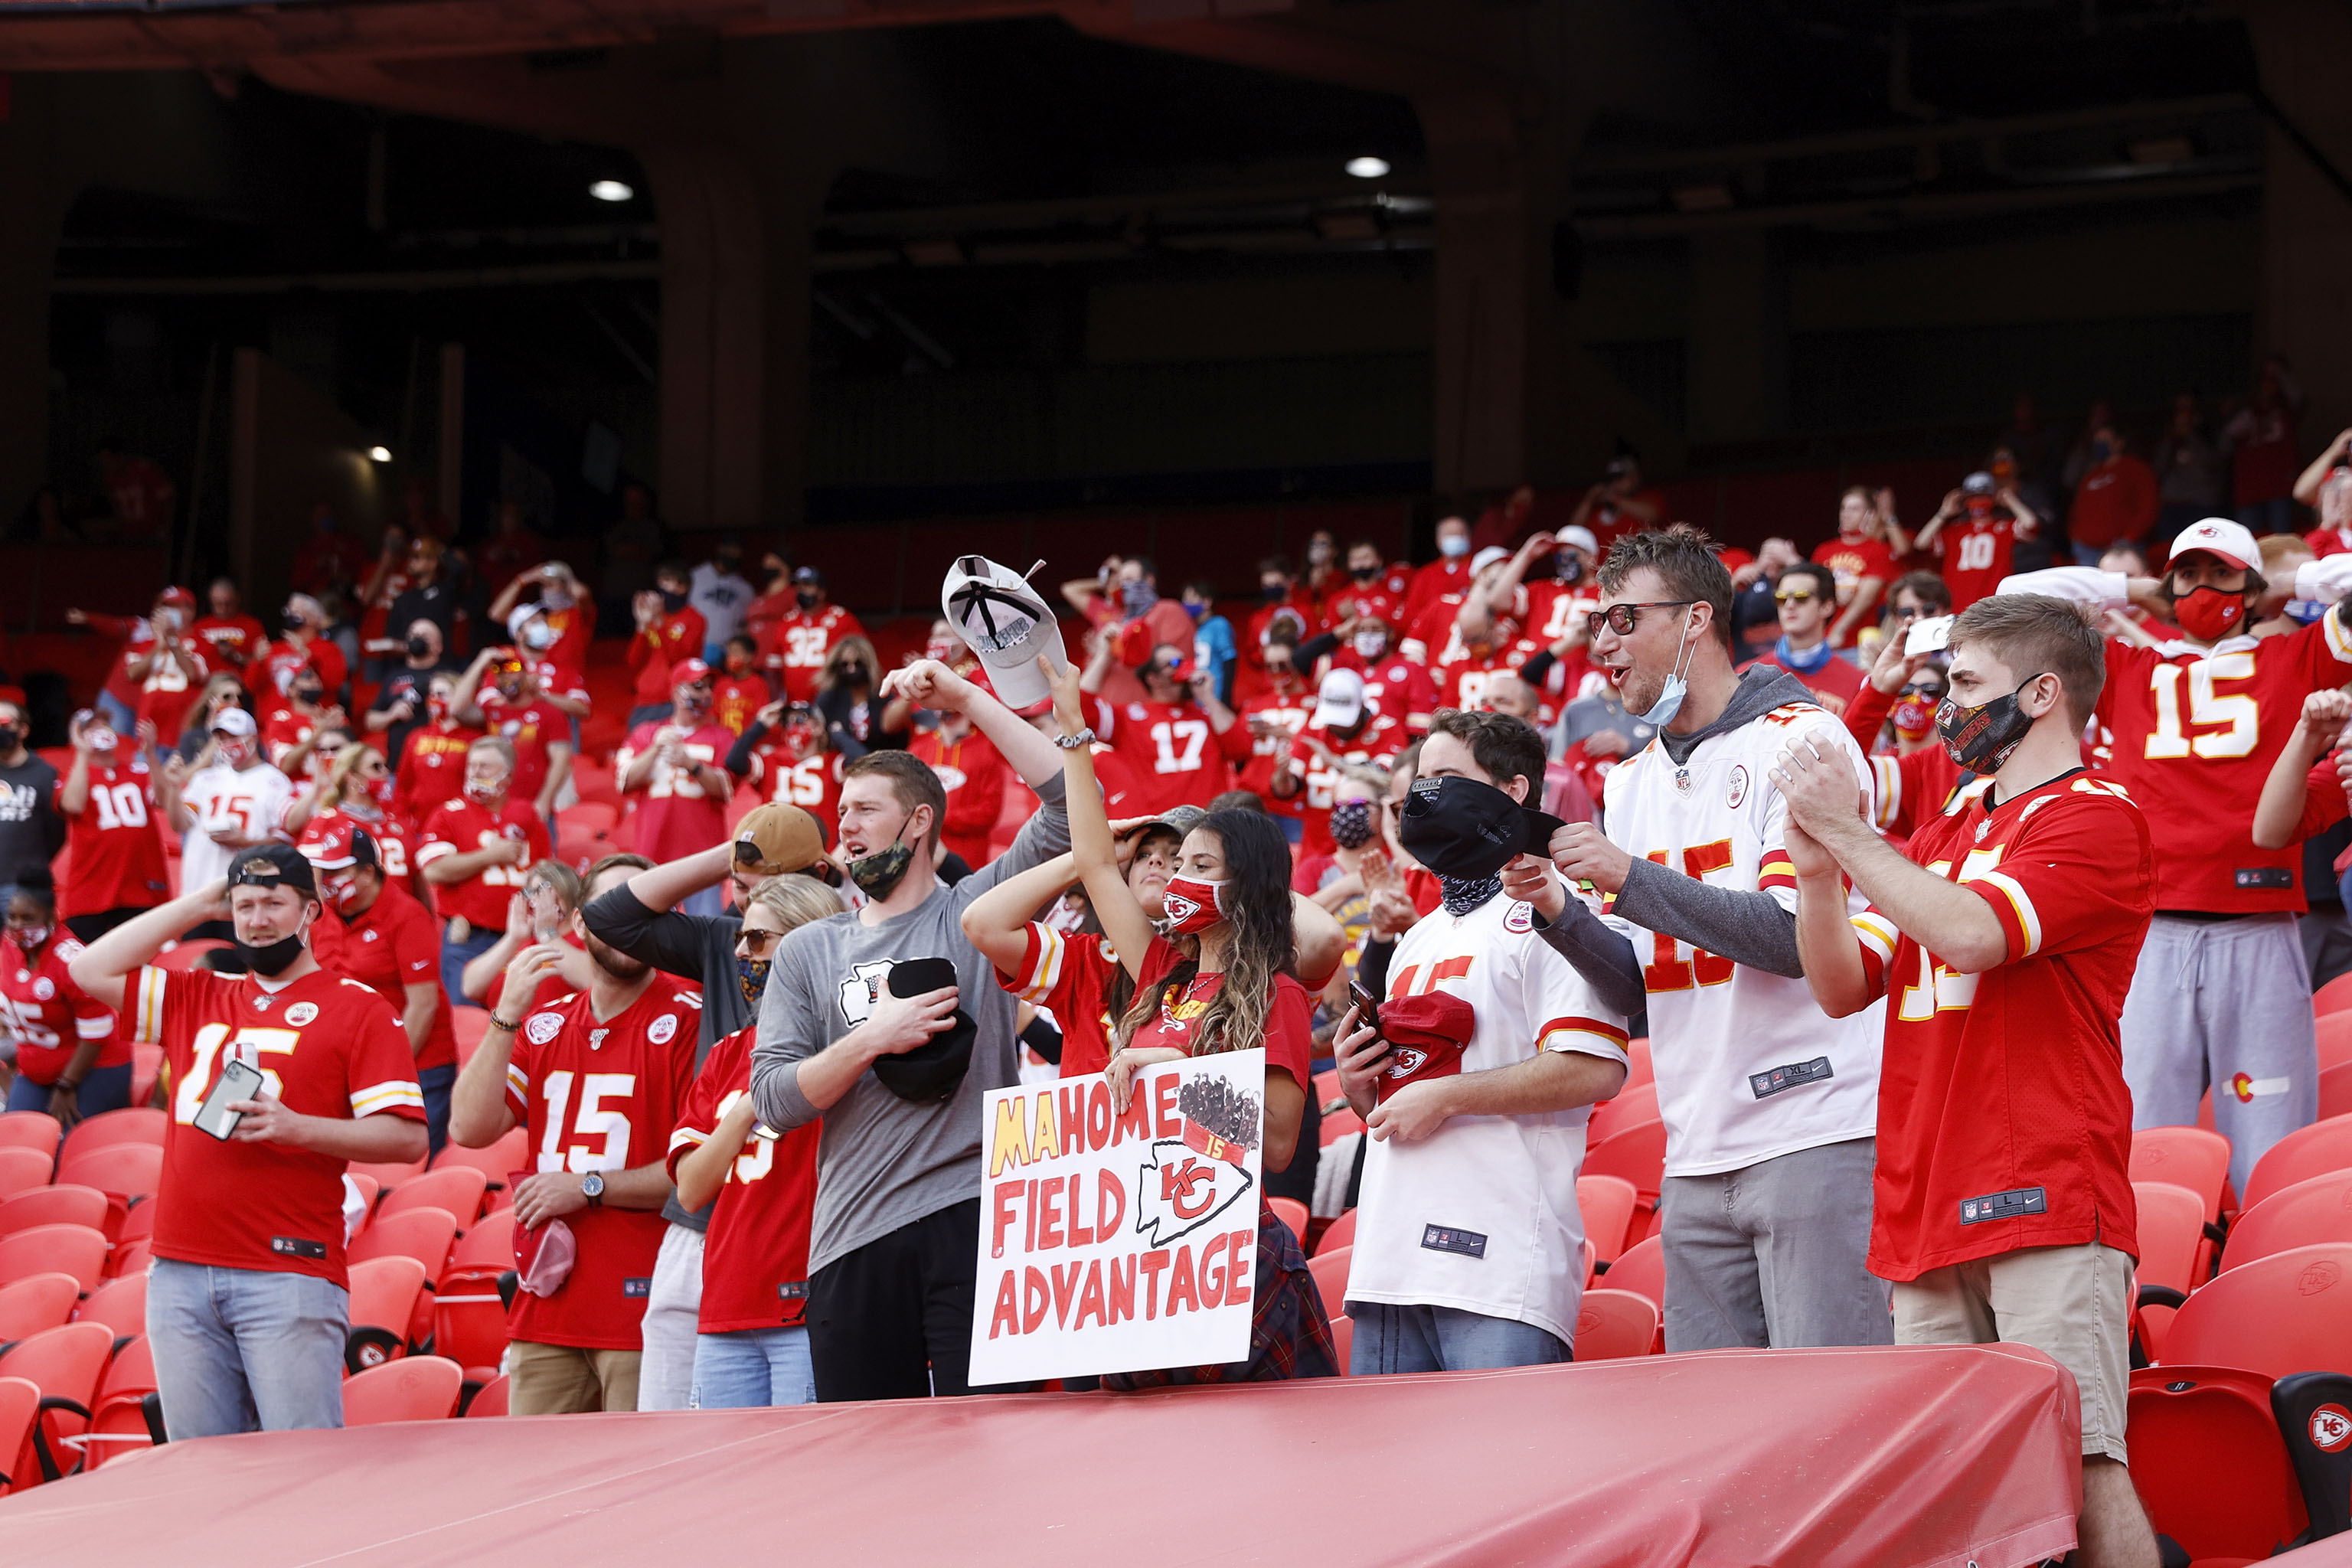 A group of Kansas City Chiefs fans seen cheering.